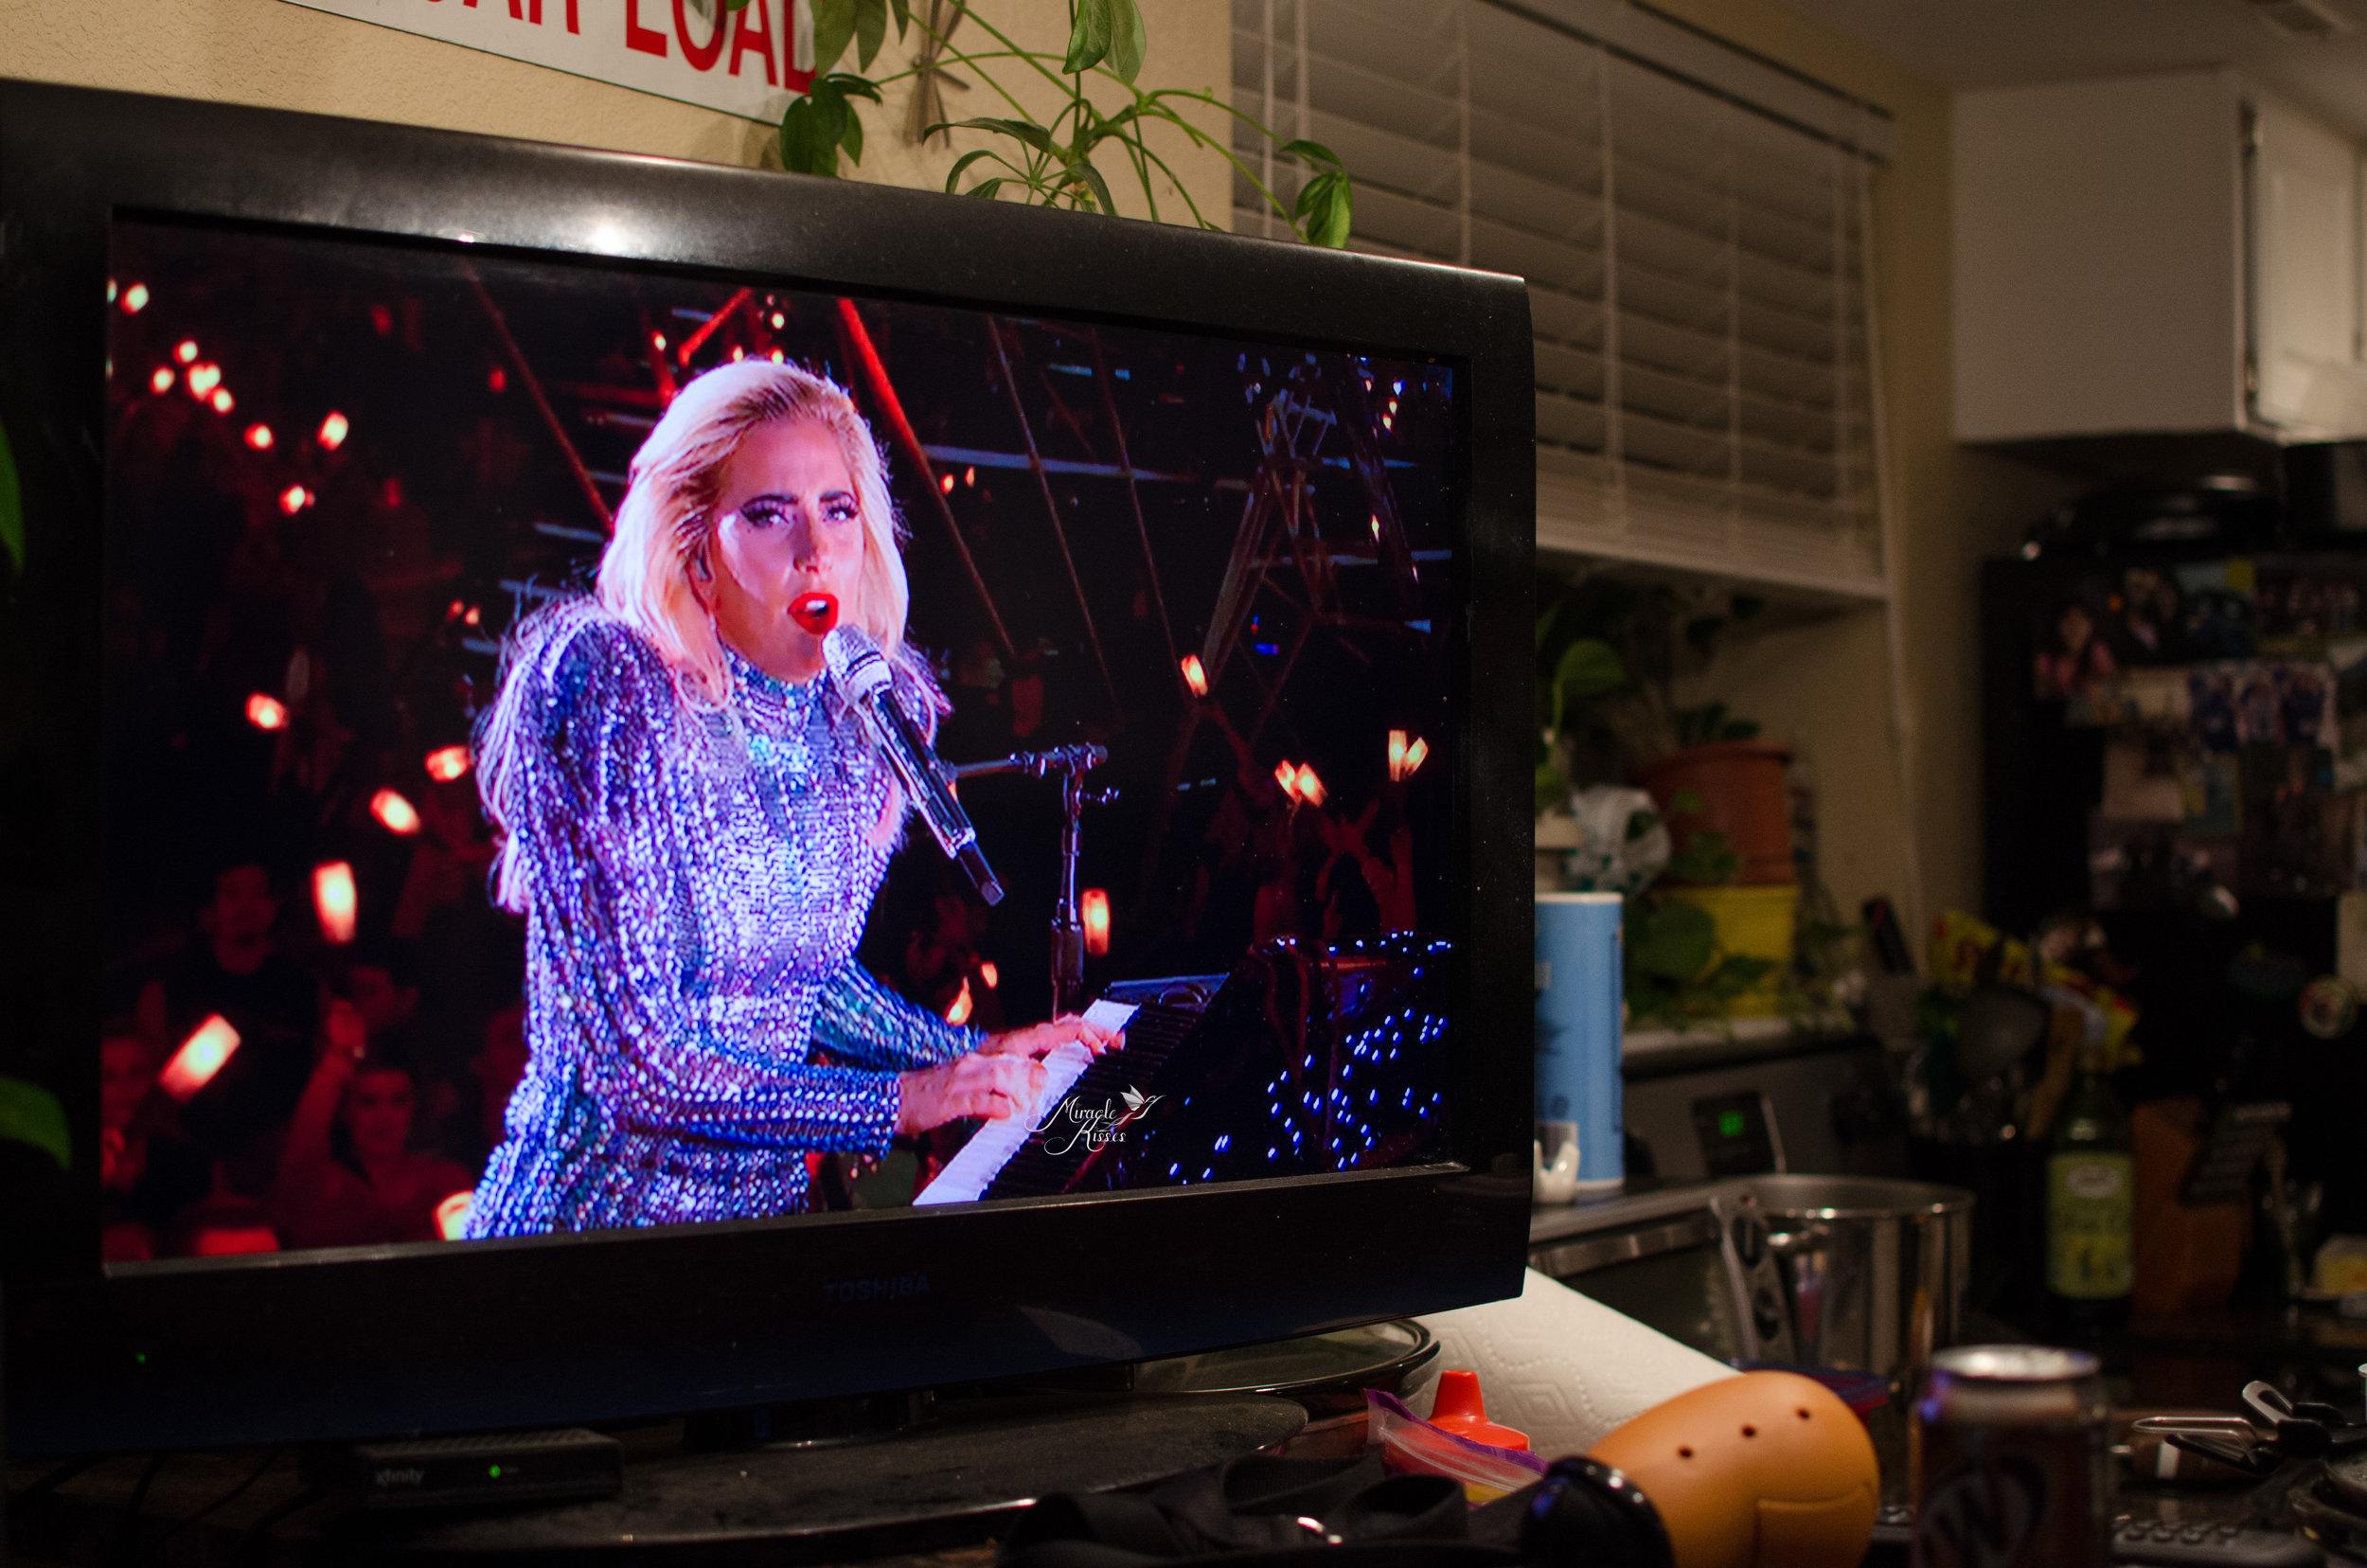 Halftime show, lady gaga, tv photo